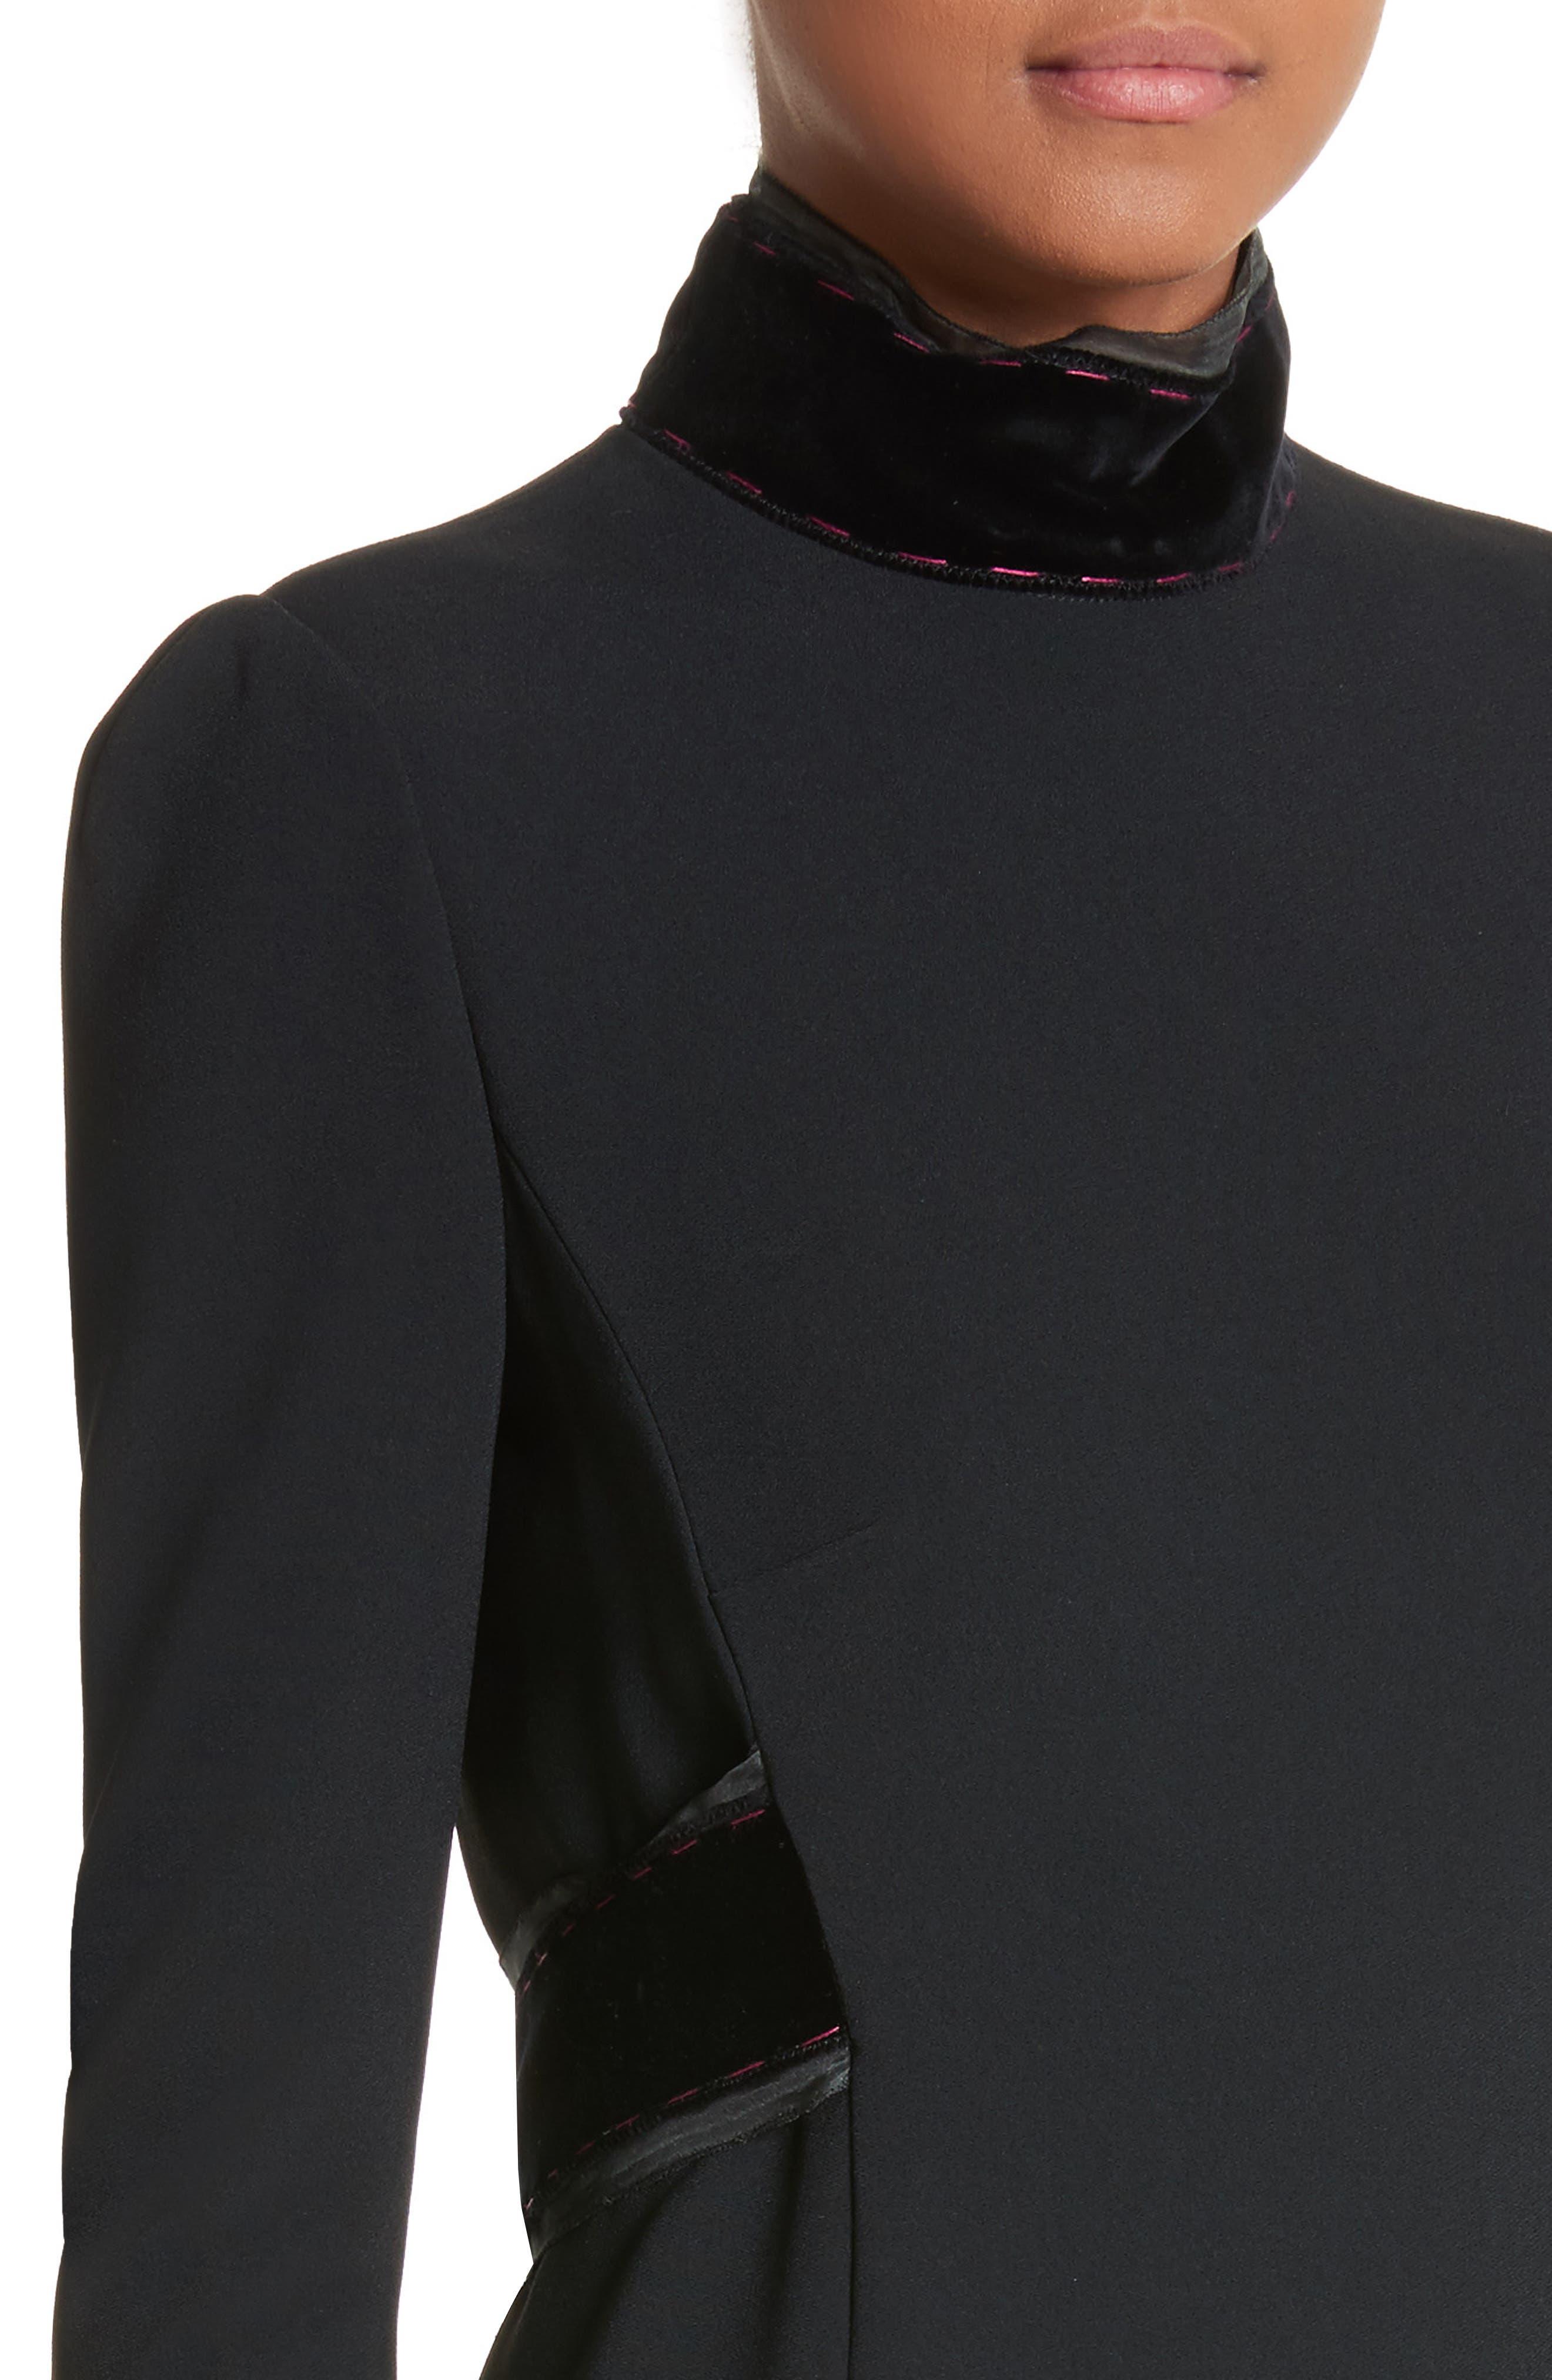 Velvet Trim Cady Turtleneck Dress,                             Alternate thumbnail 4, color,                             001